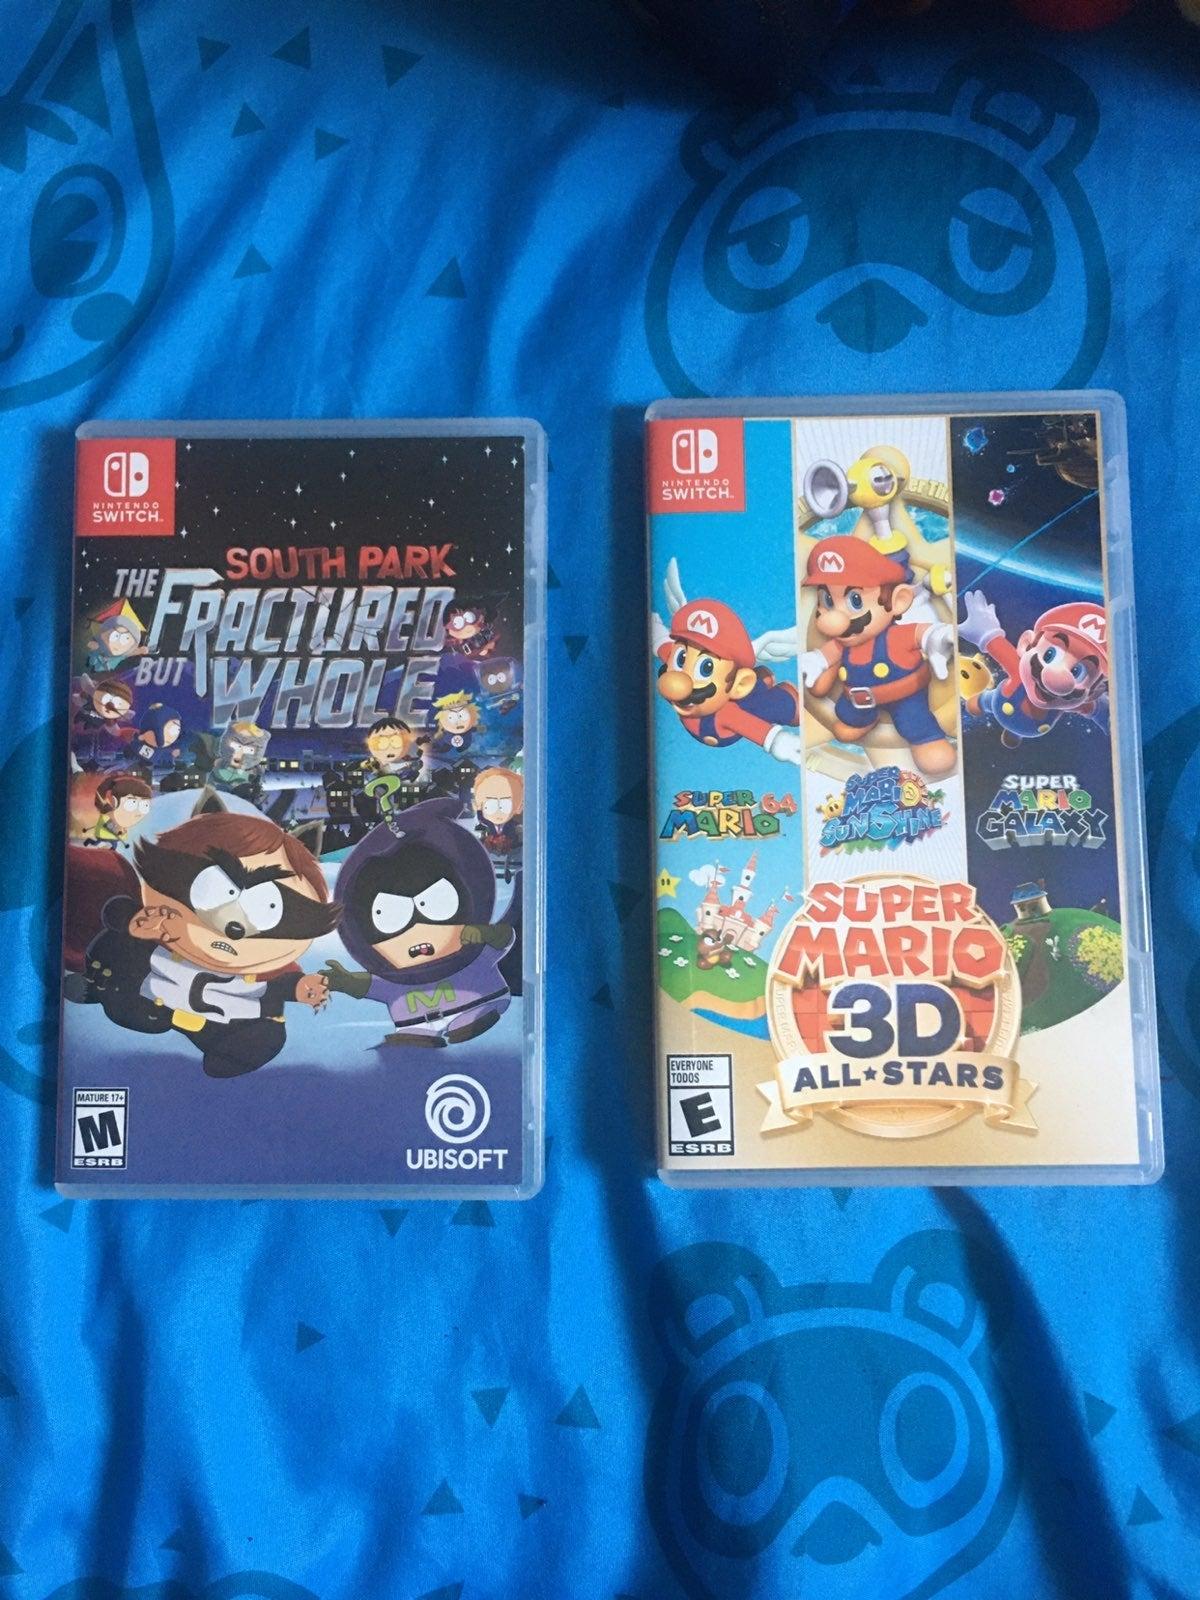 Super Mario 3D All Stars & South Park